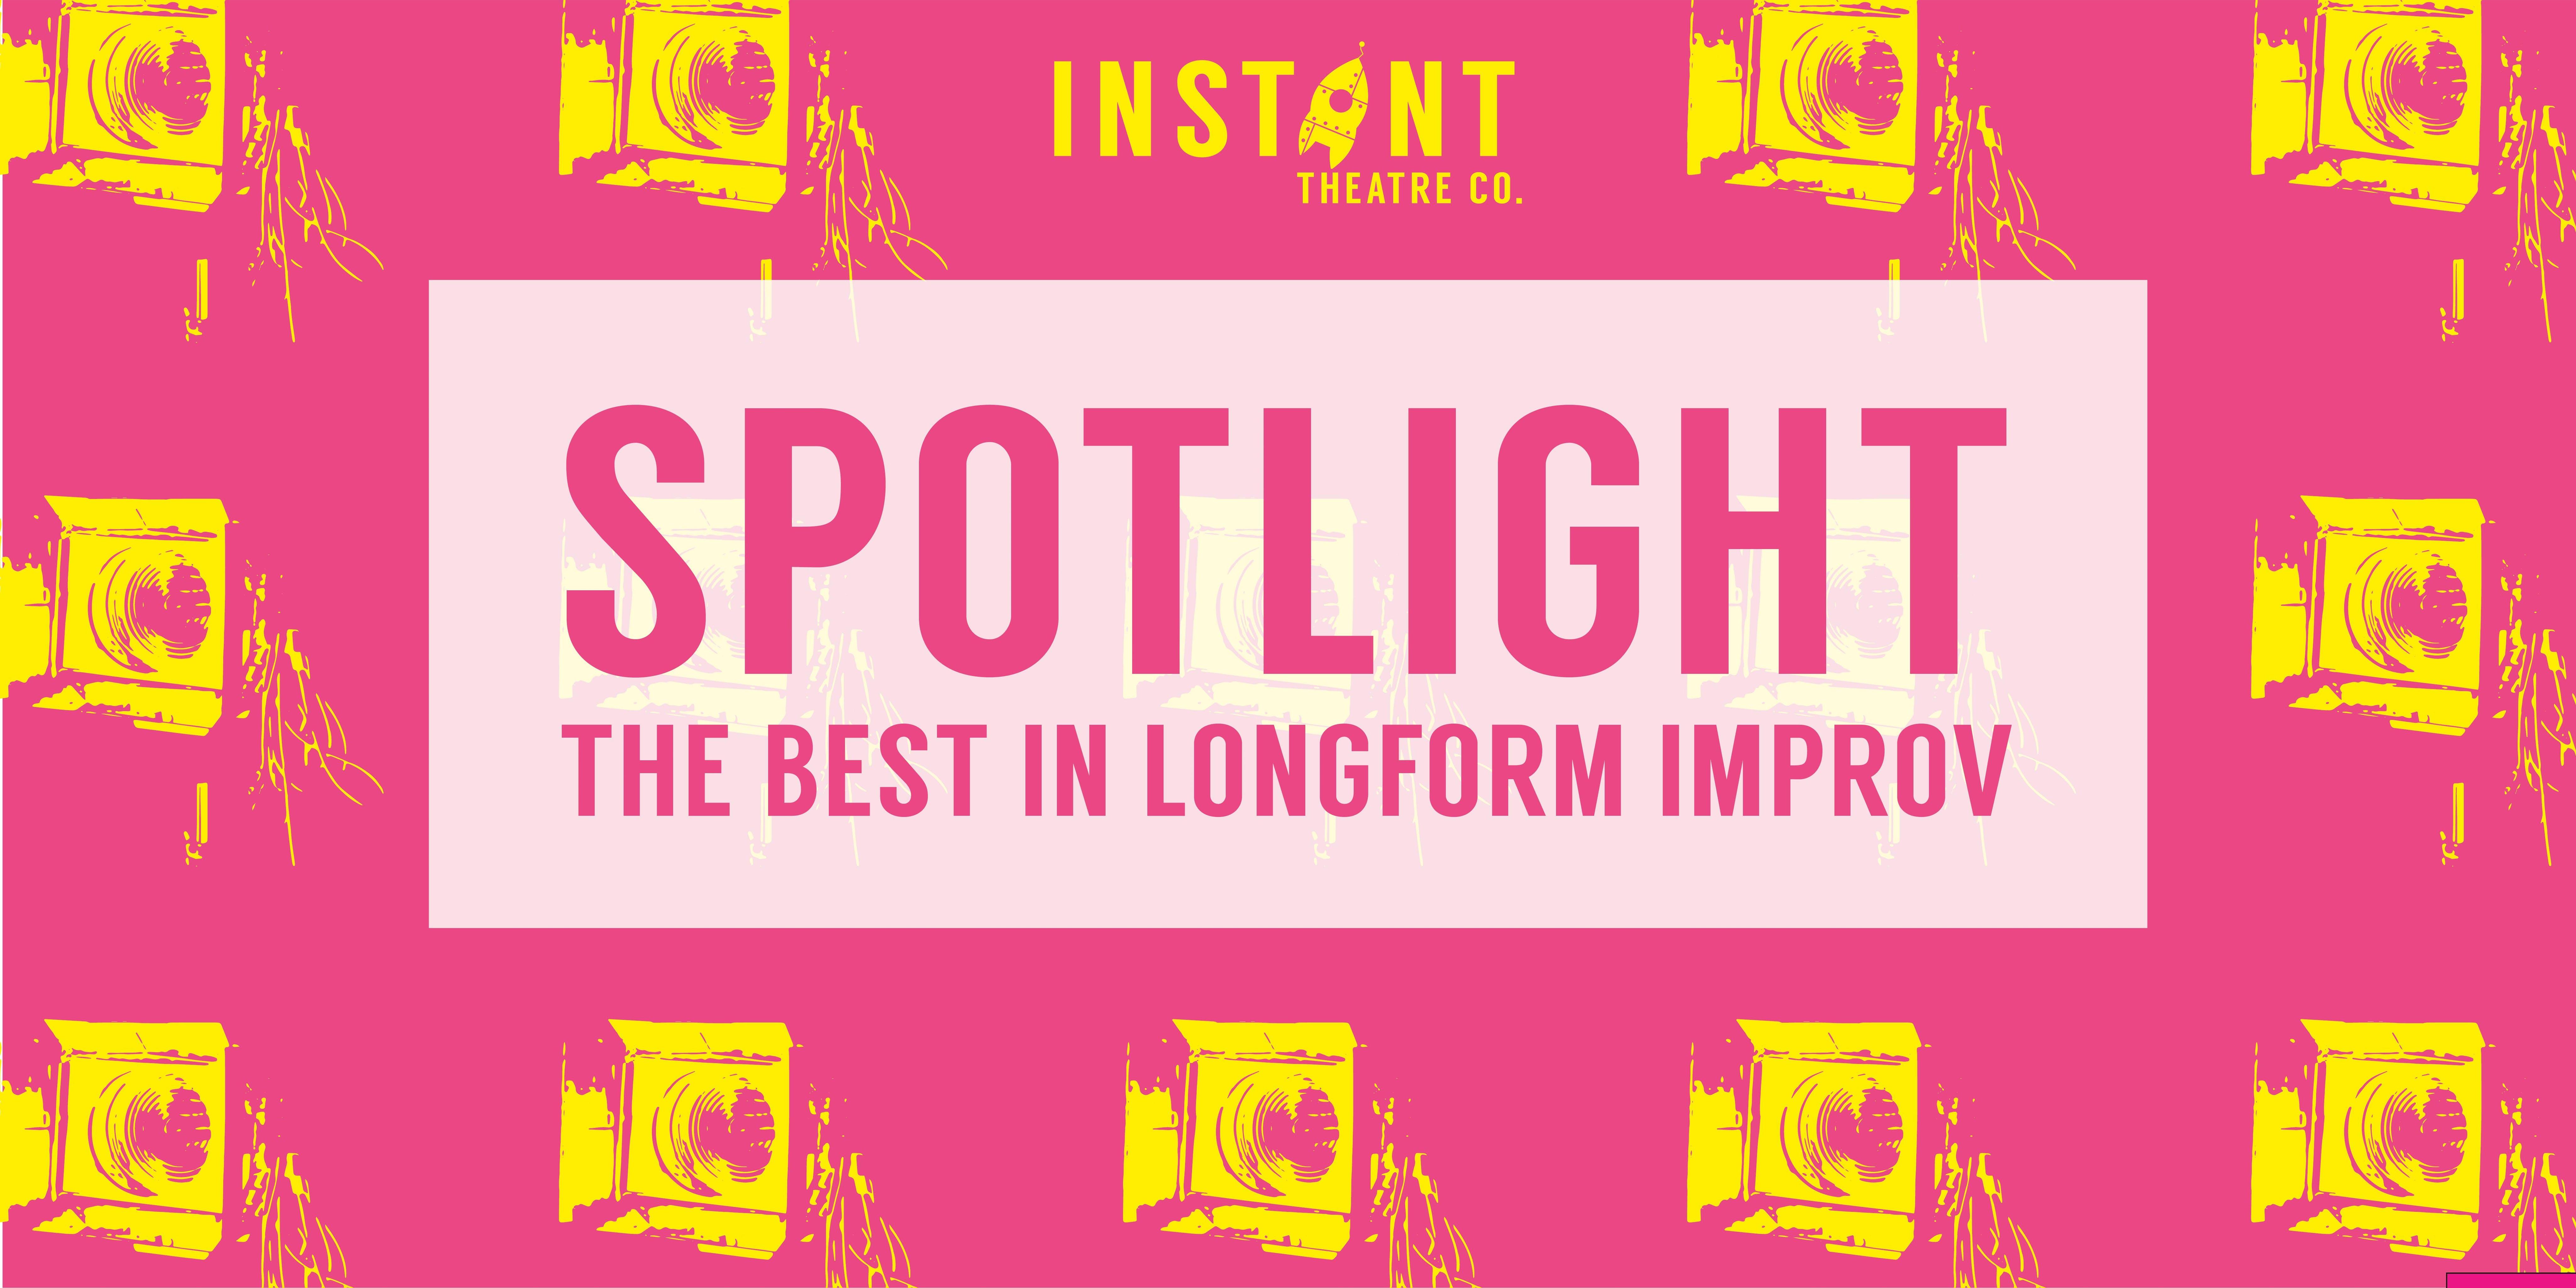 SPOTLIGHT The Best In Longform Improv